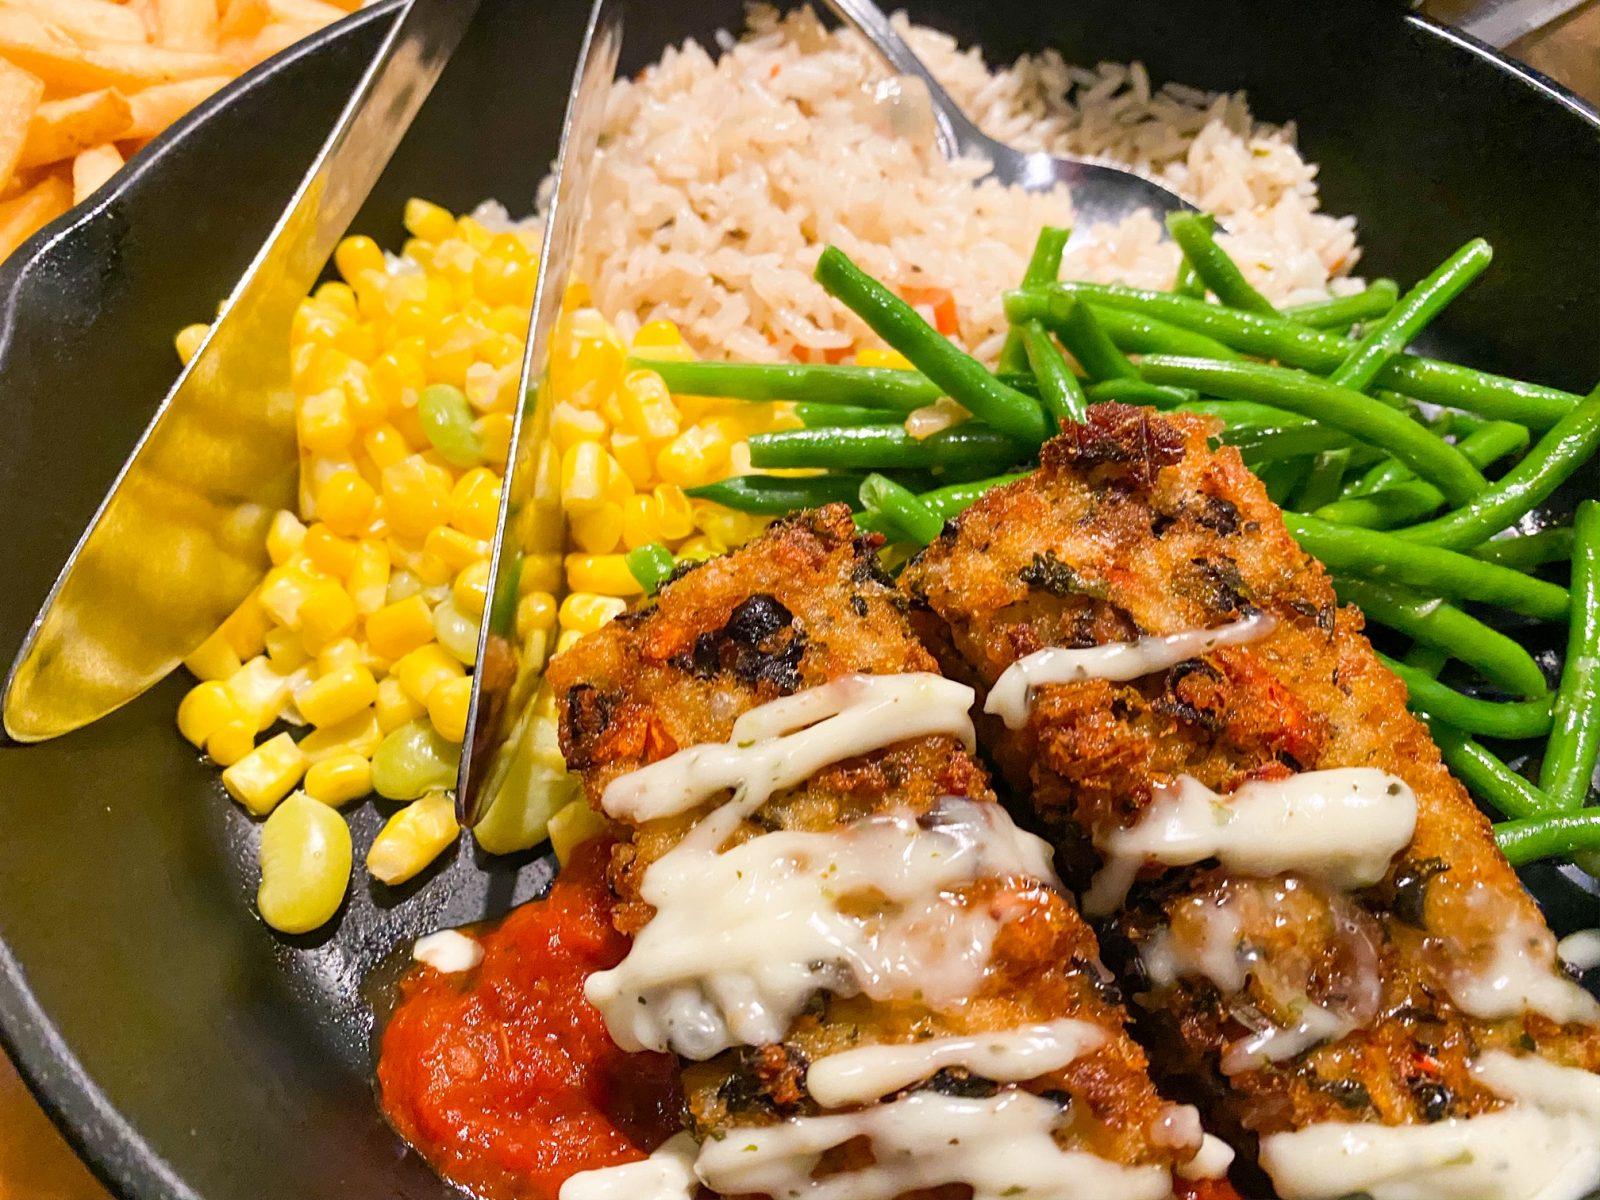 vegan menu option at Garden Grill